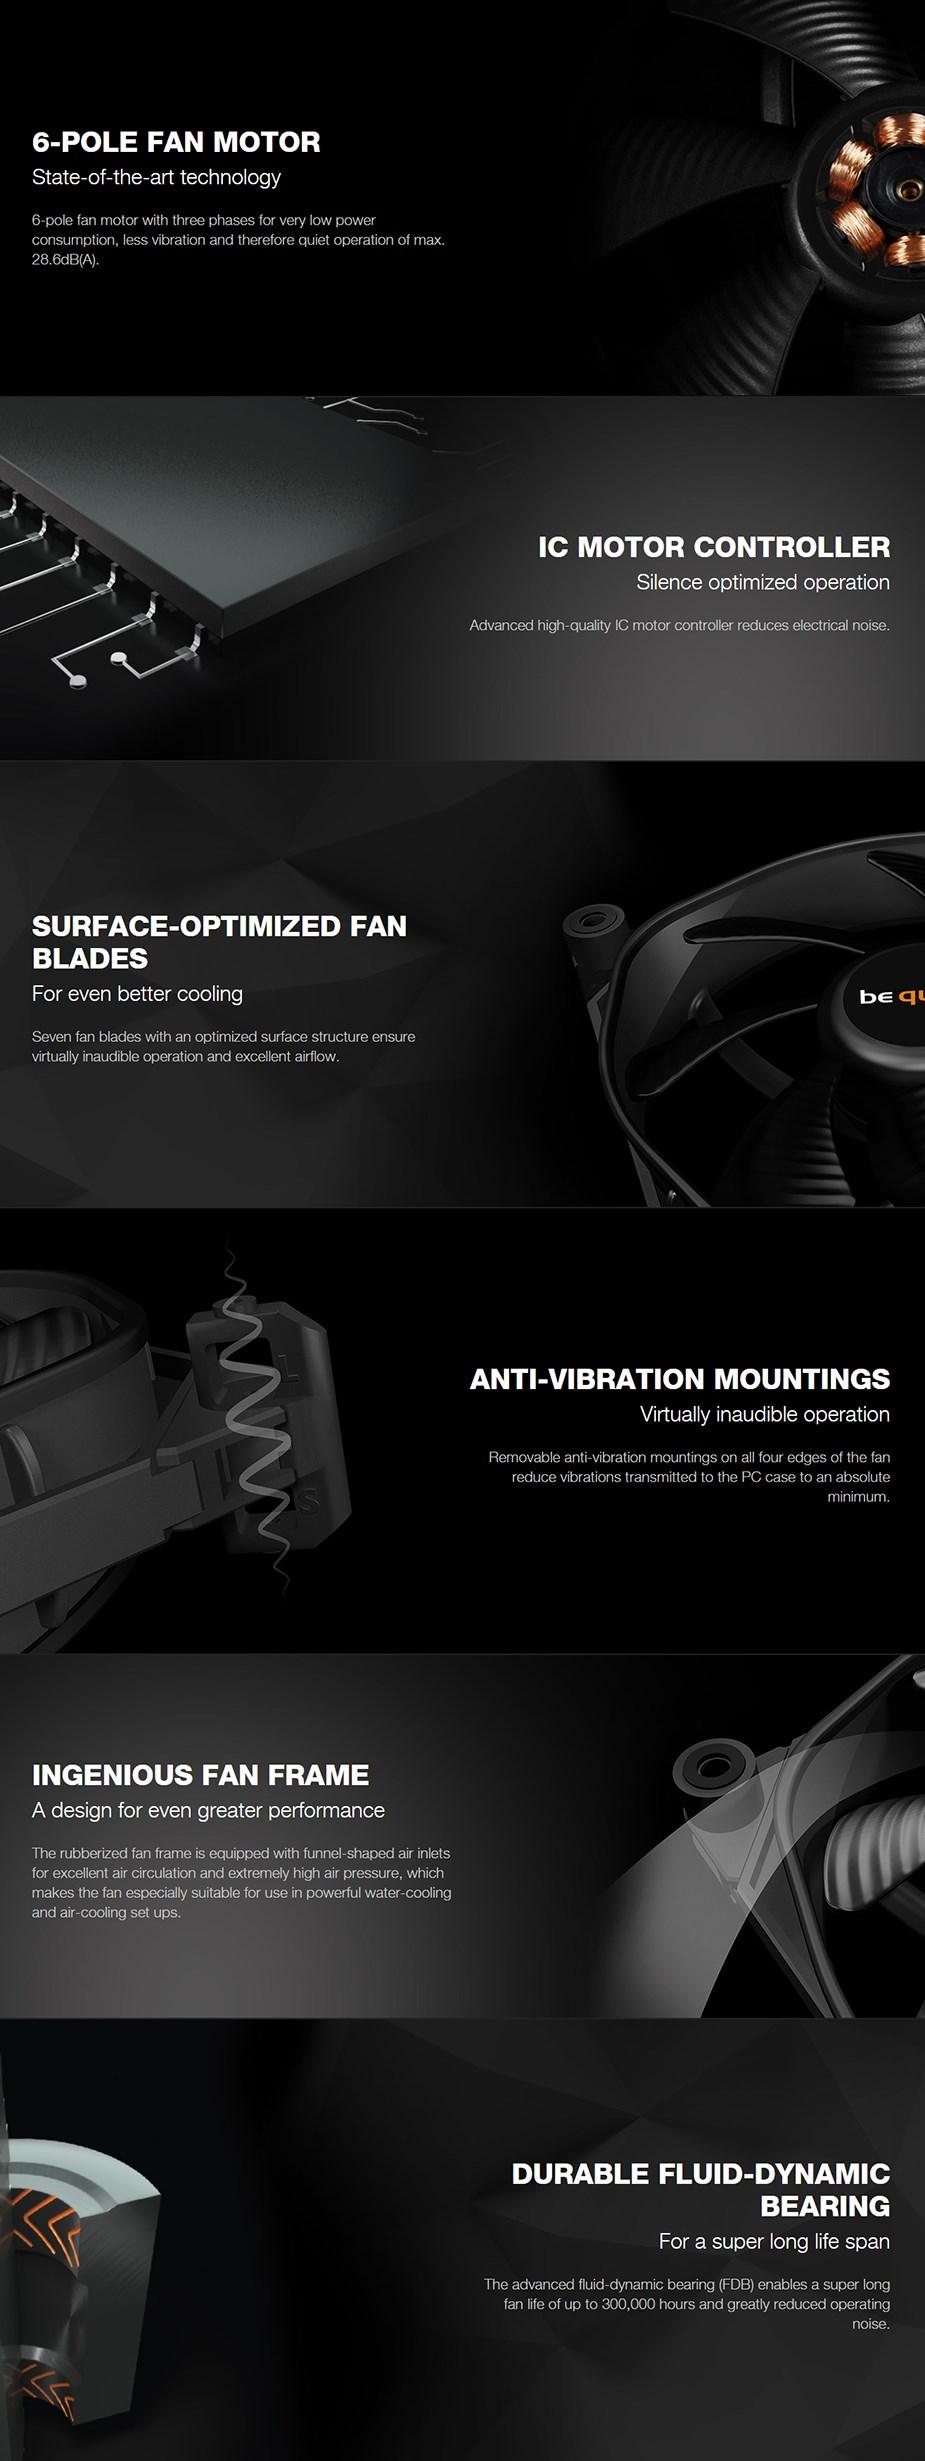 be quiet! Silent Wings 3 120mm Case Fan - High-Speed Edition - Desktop Overview 1